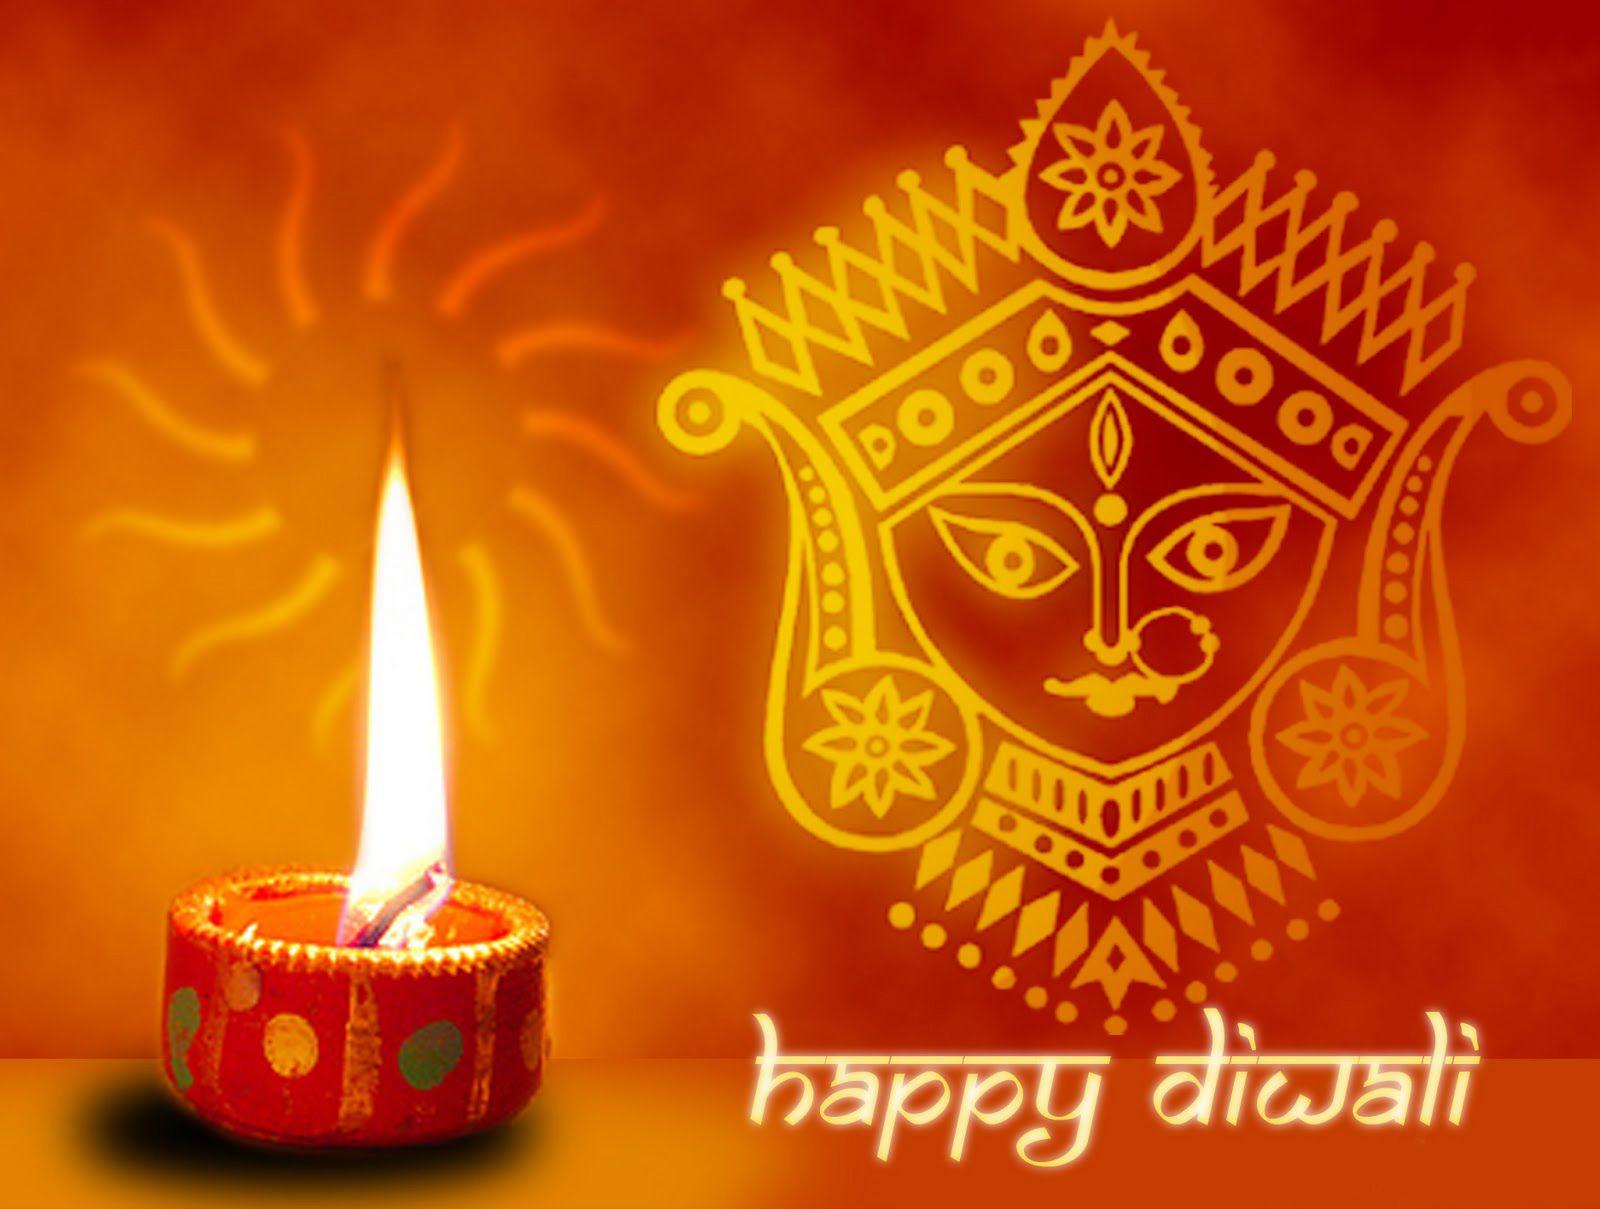 happy diwali 2018 photo galleries free download in 2018 happy